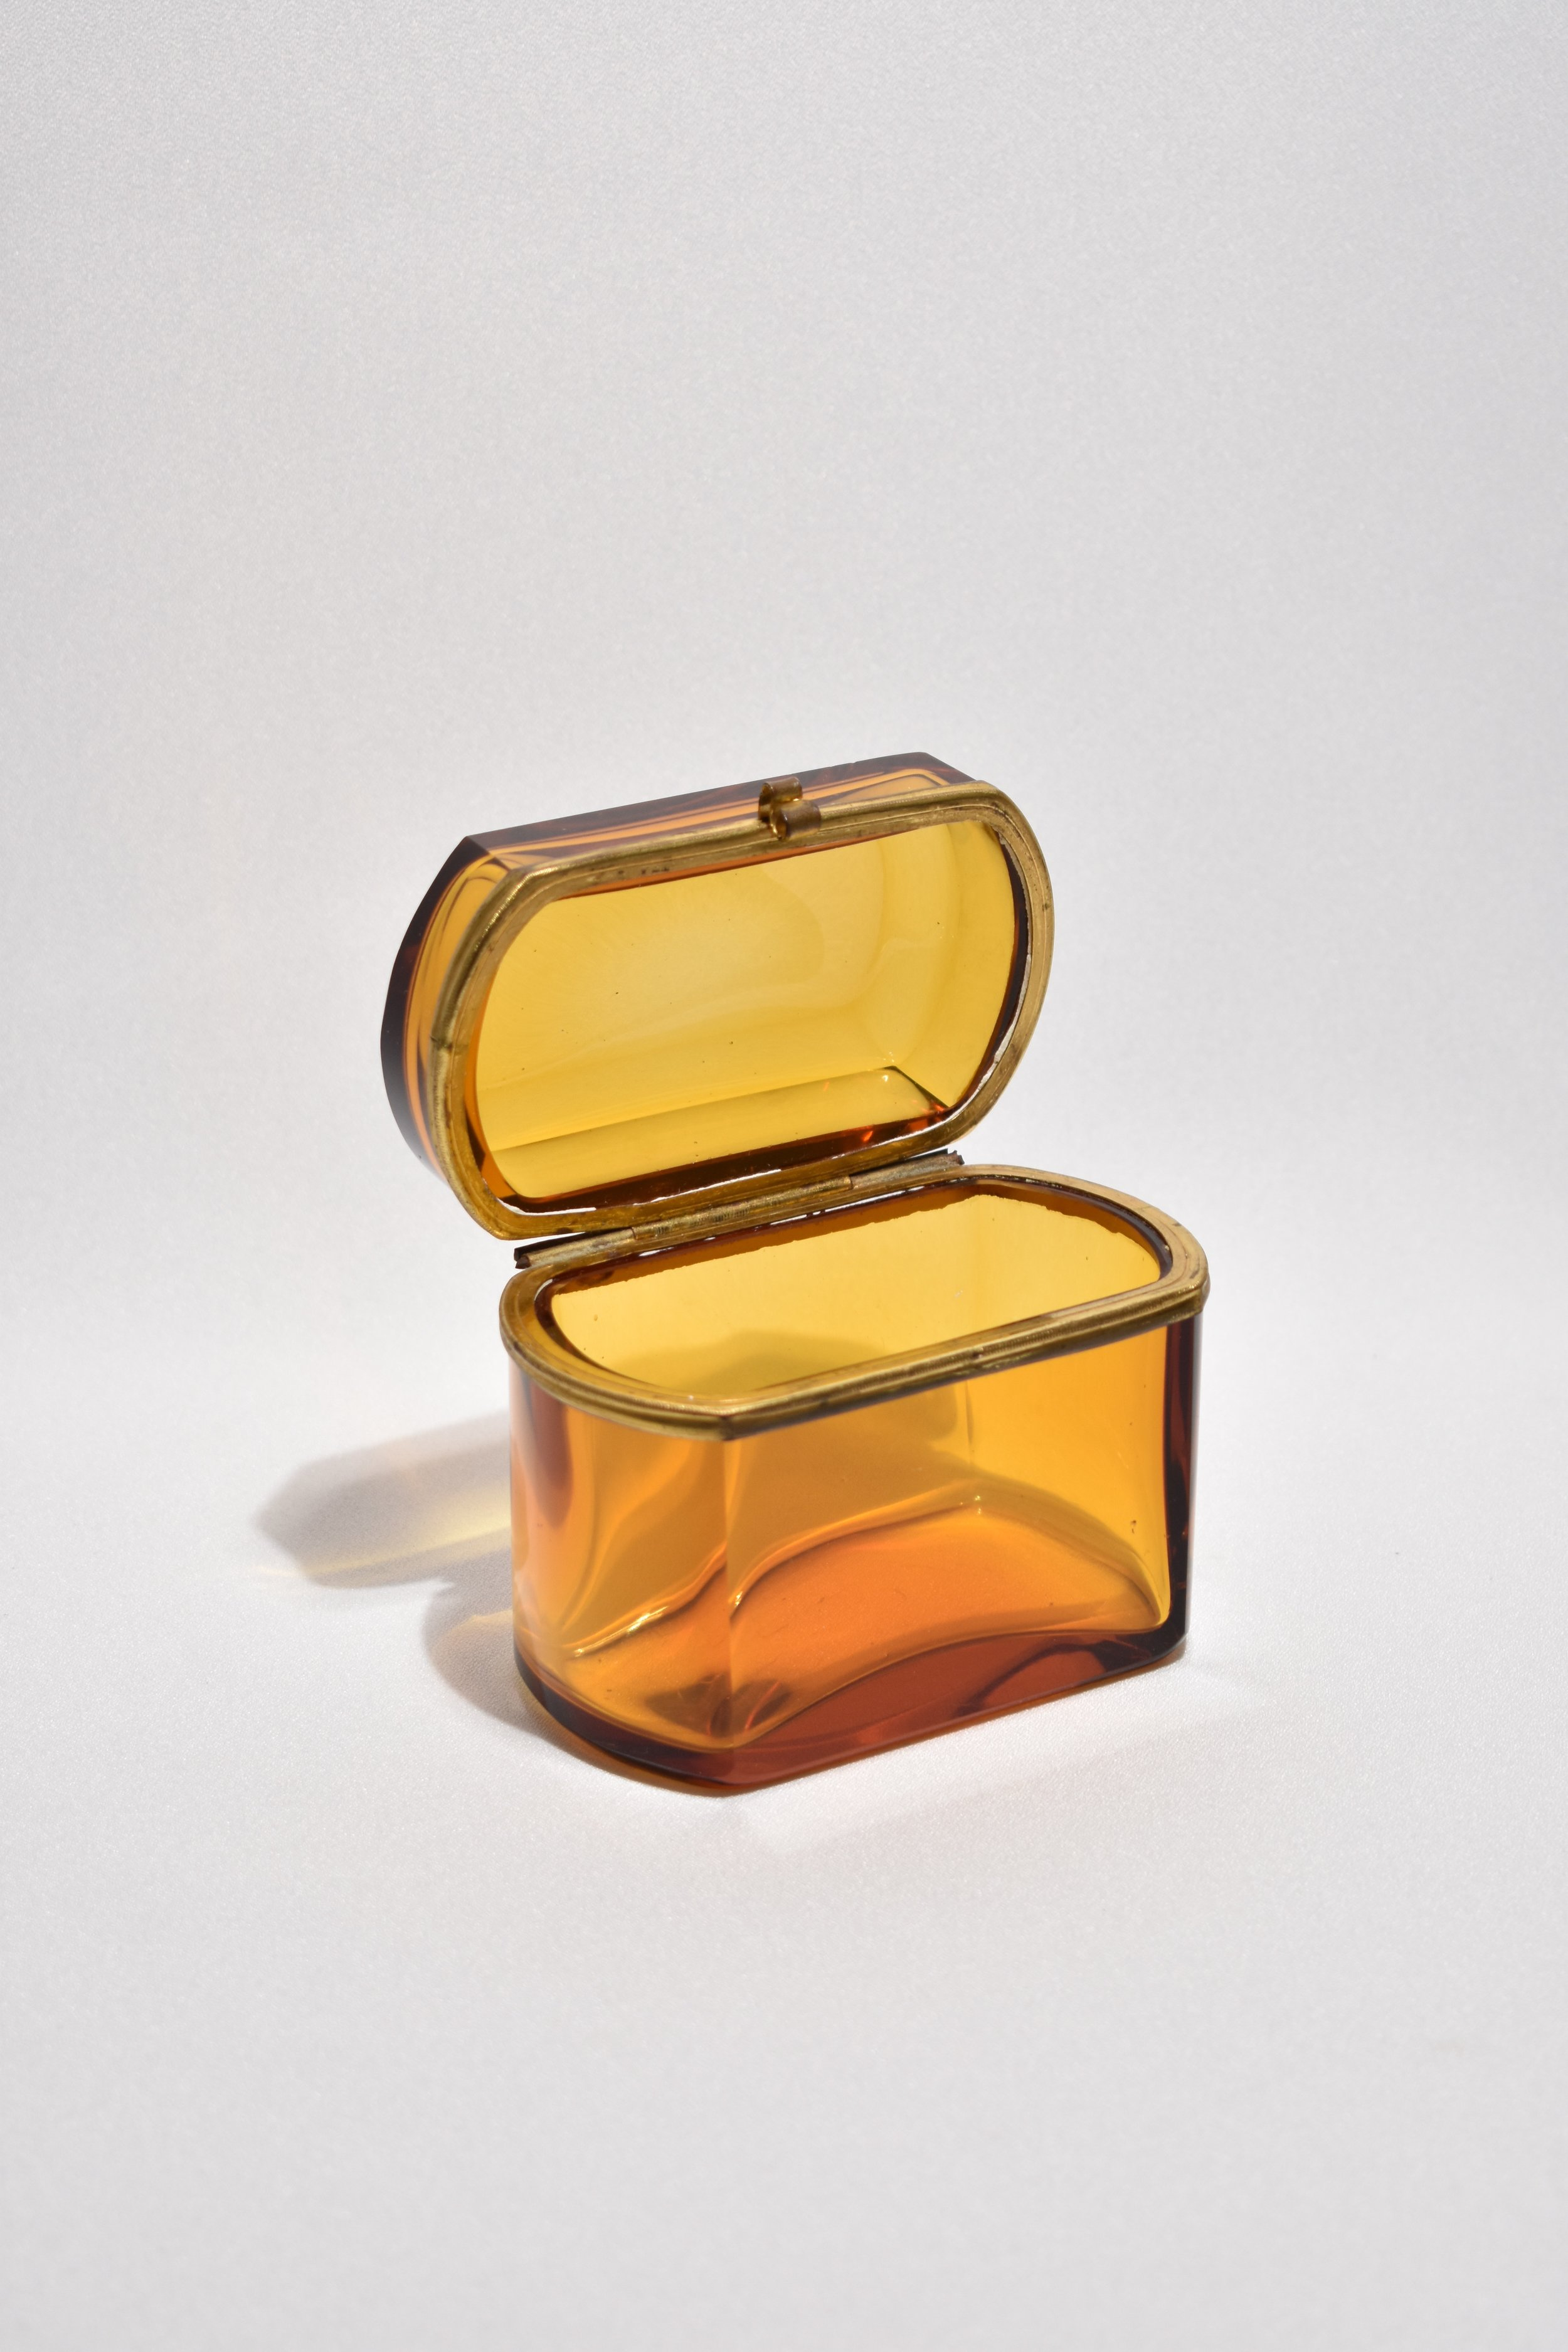 Casa Shop; Amber Glass Hinged Box